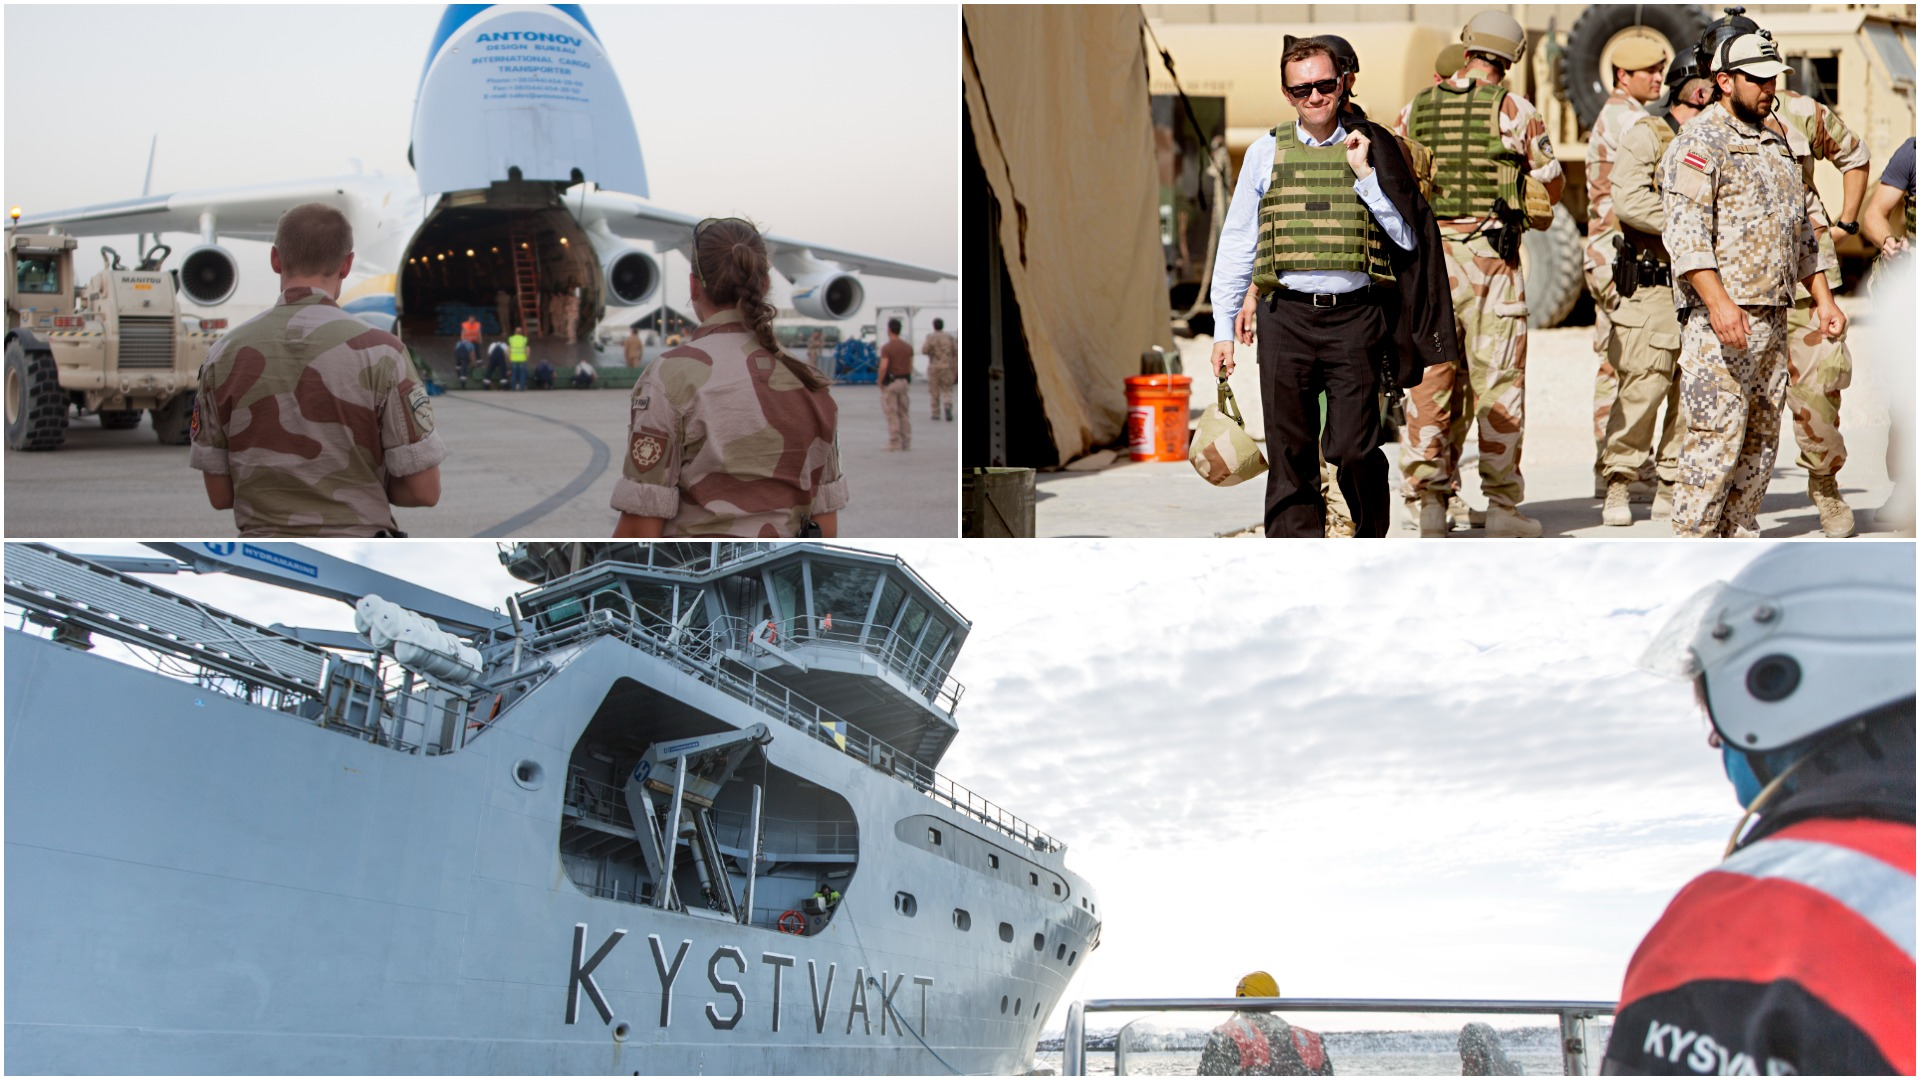 Foto øverst til venstre: Aleksander Hage / Forsvaret. Foto øverst til høyre: Stian Lysberg Solum. Foto nederst: Christina Gjertsen / Forsvaret.